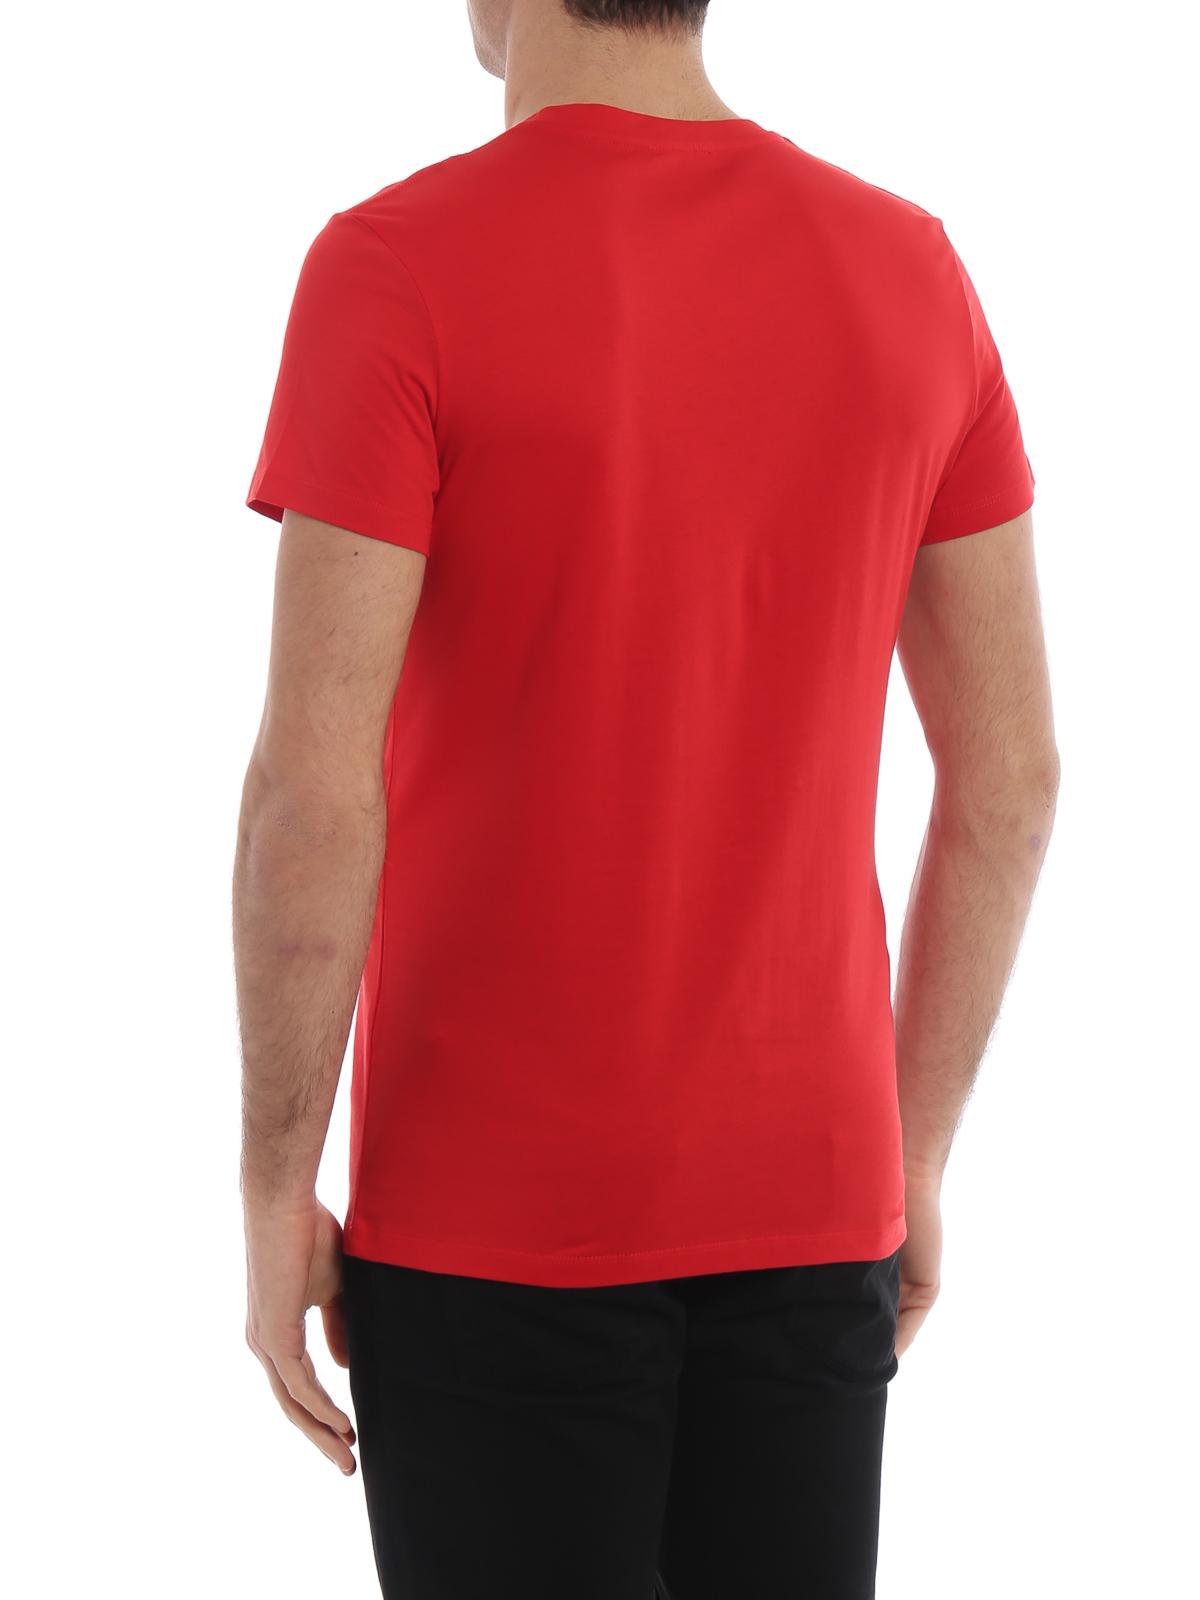 cc85eb6a6 Balmain - Balmain logo print red T-shirt - t-shirts - RH01601I1263AA